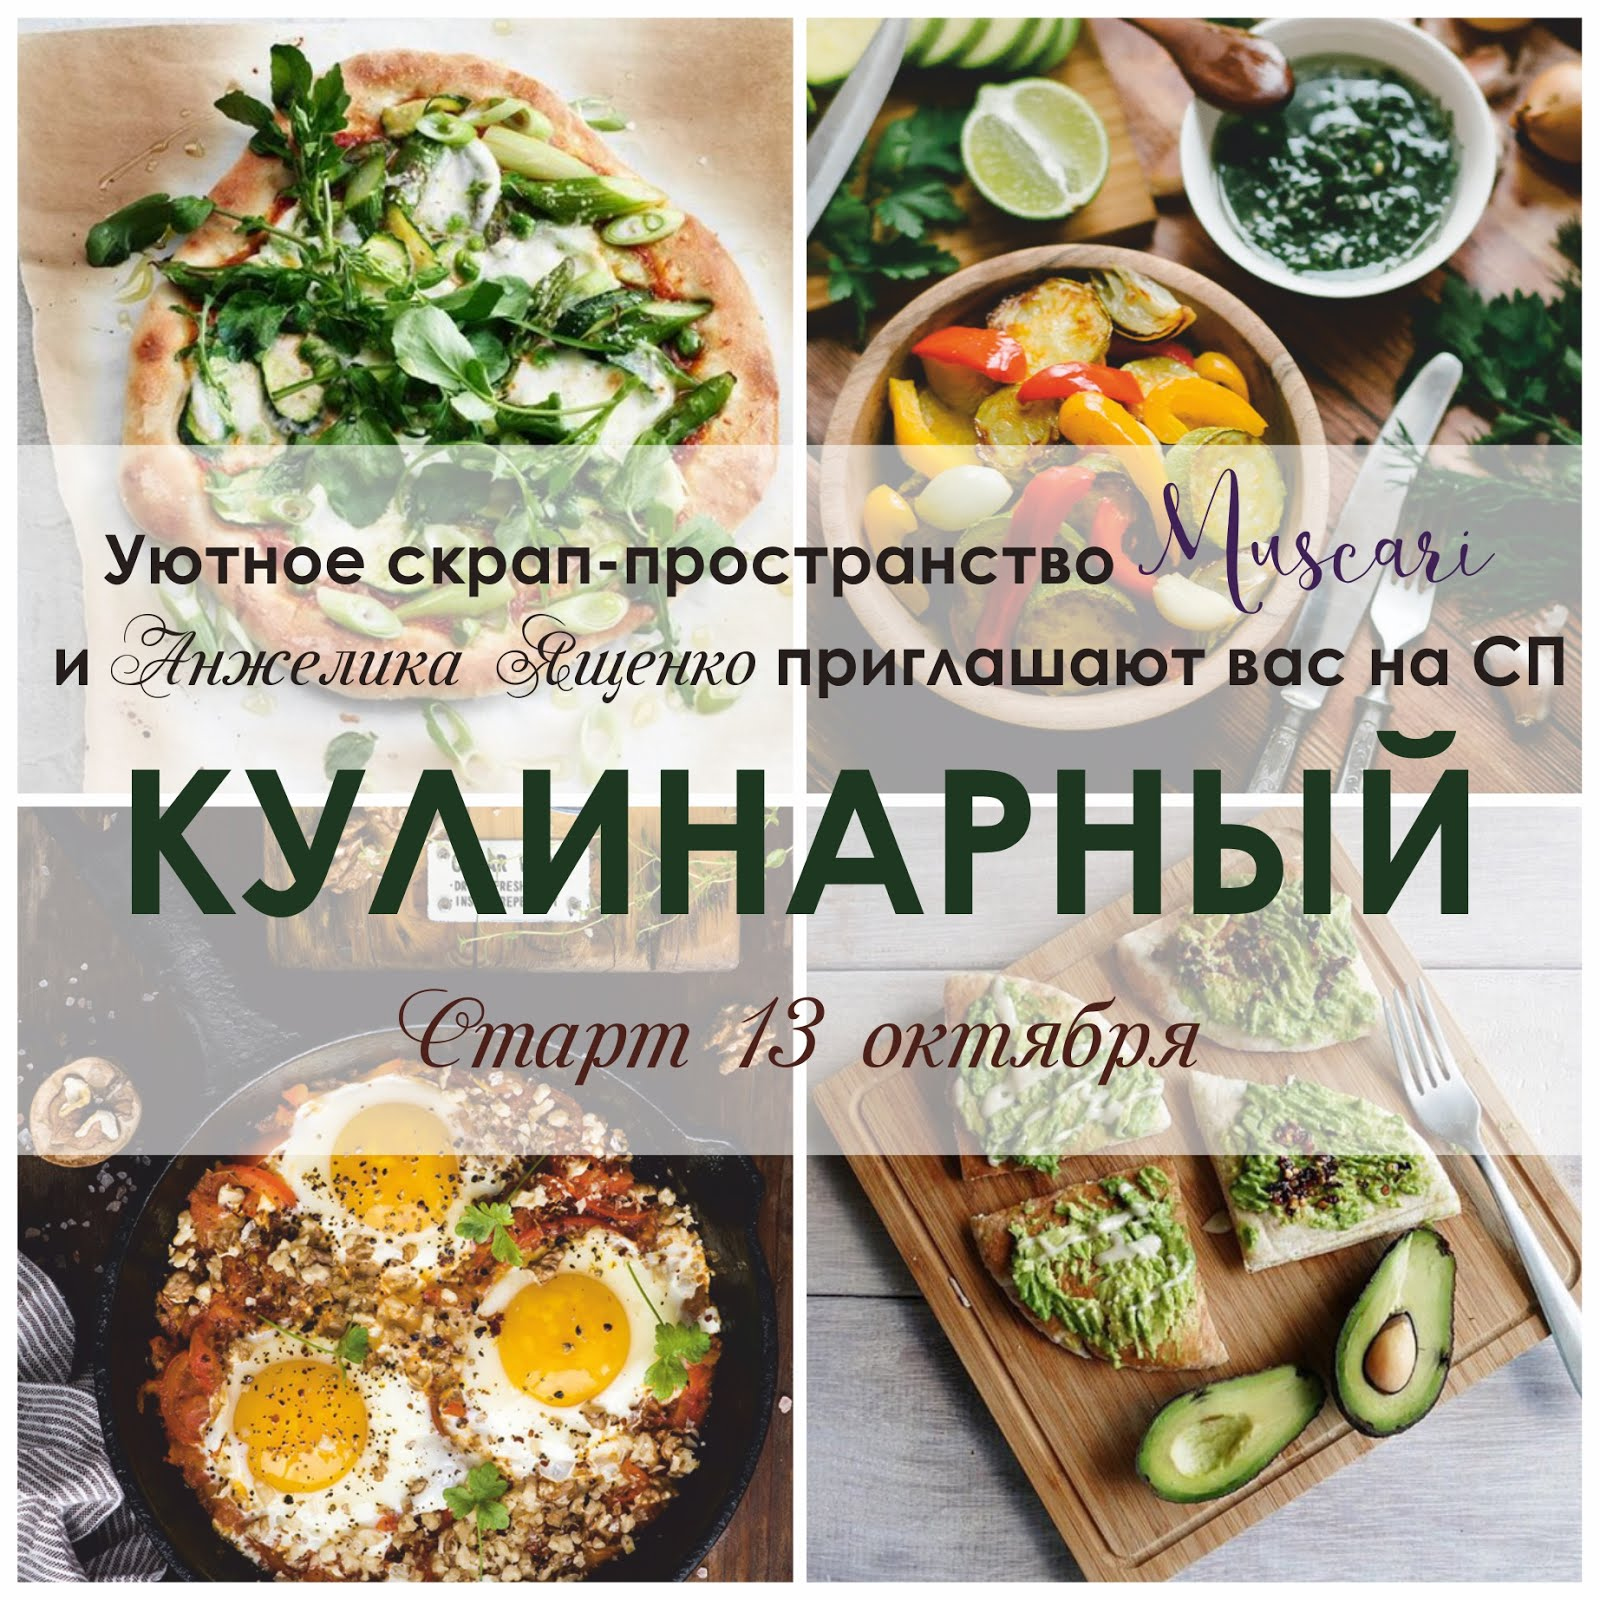 Кулинарный СПс блогом muscari